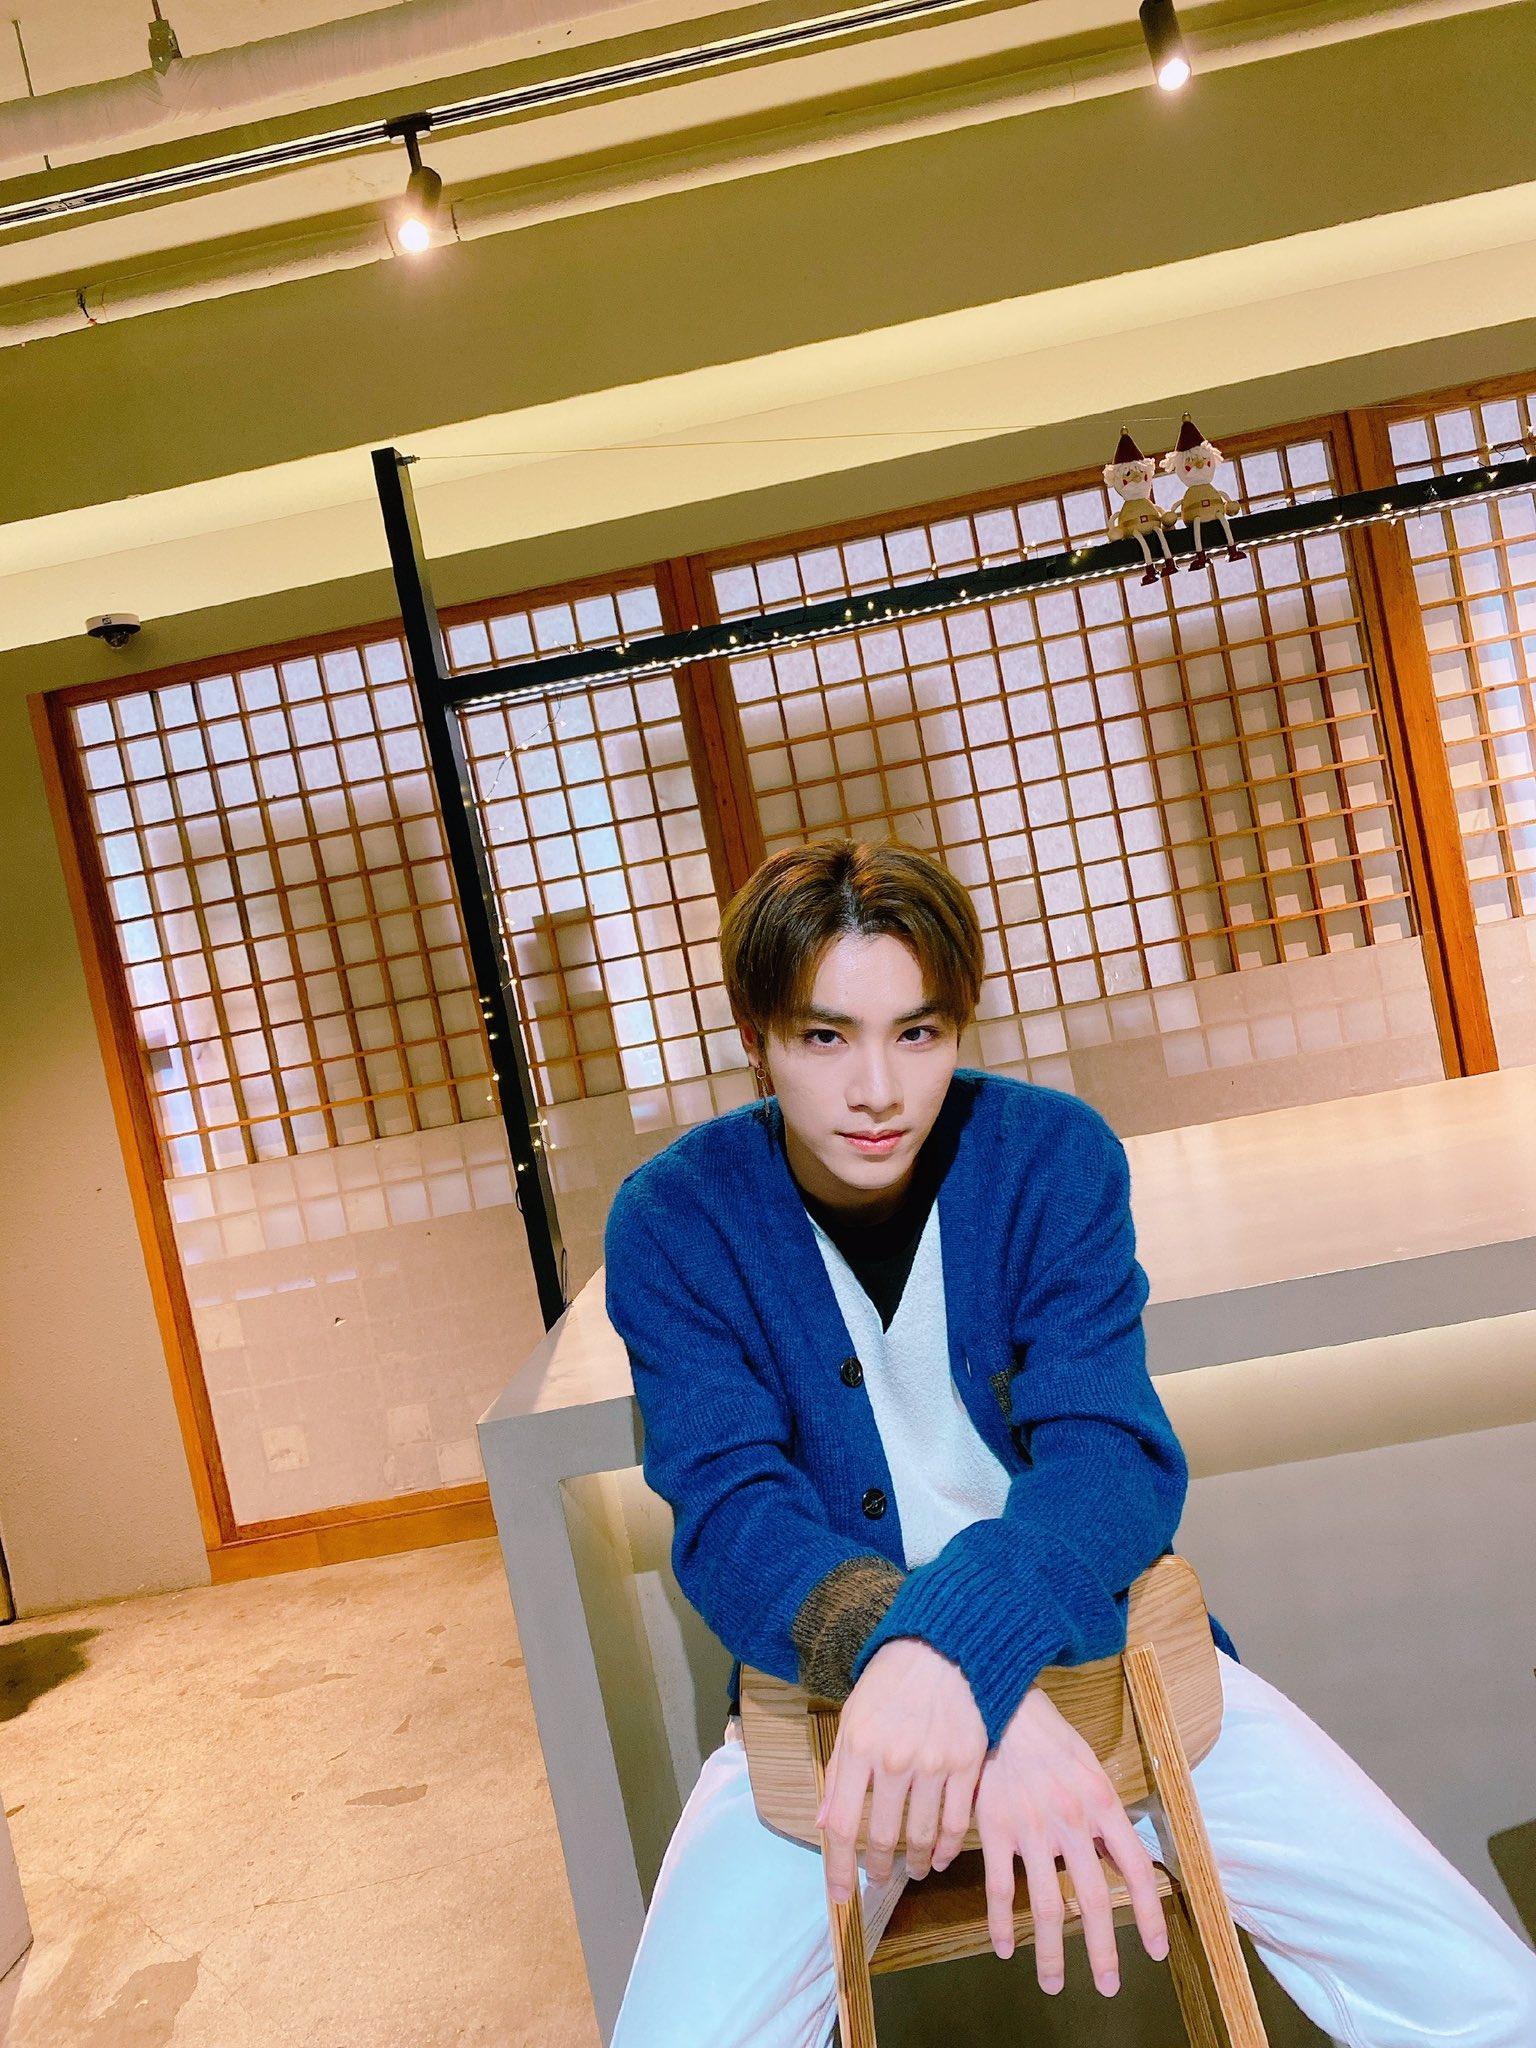 wayv nct xiaojun weibo